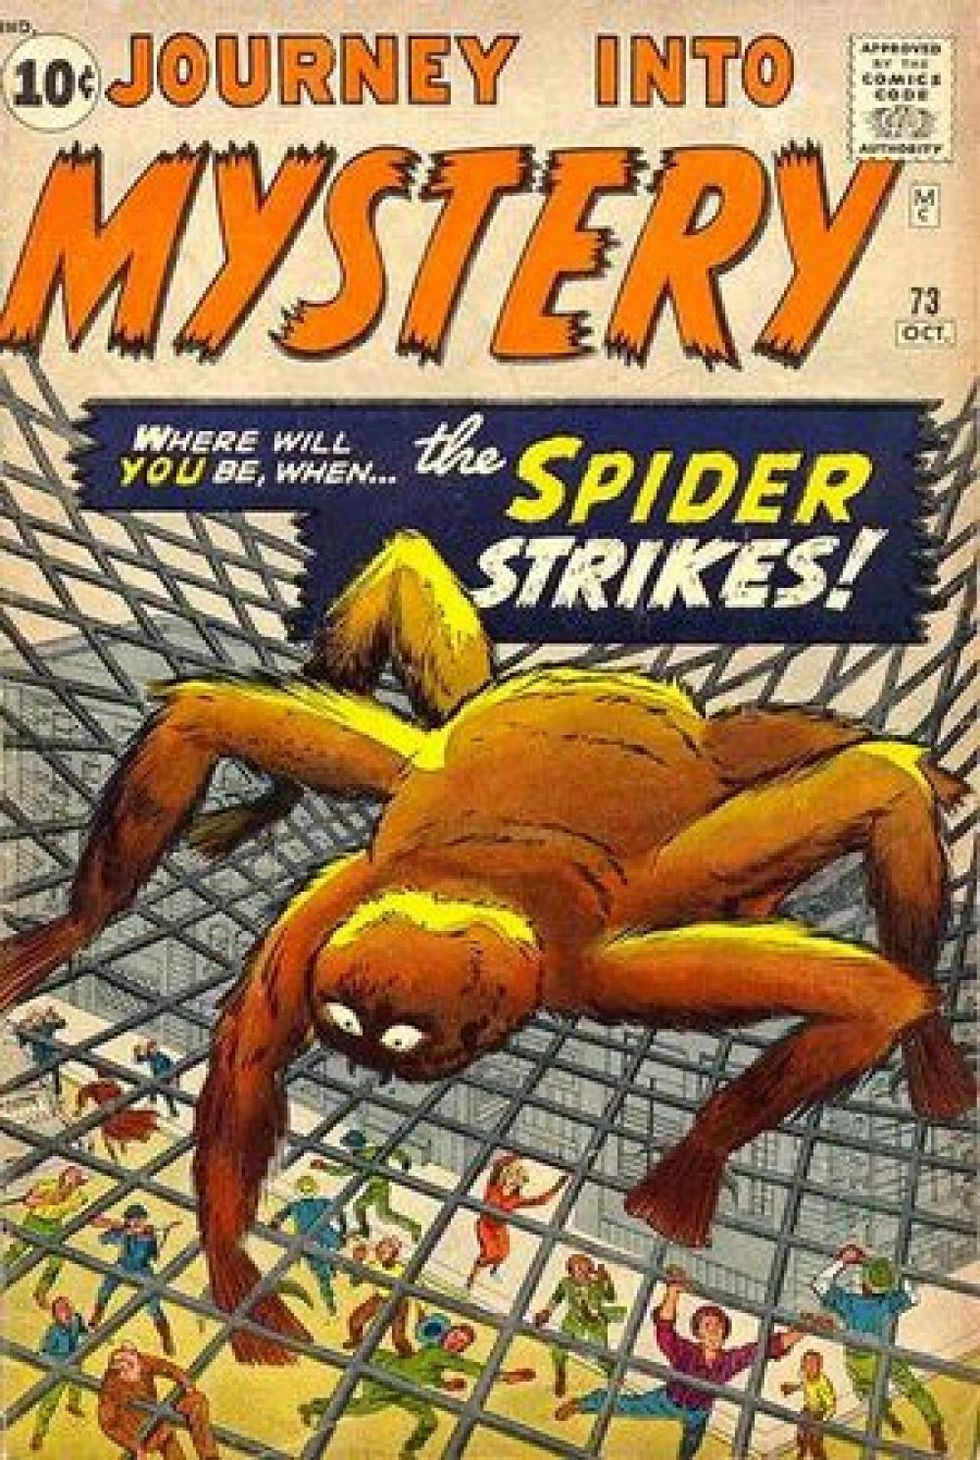 Journey Into Mystery #73 (1961) (Foto: Marvel)